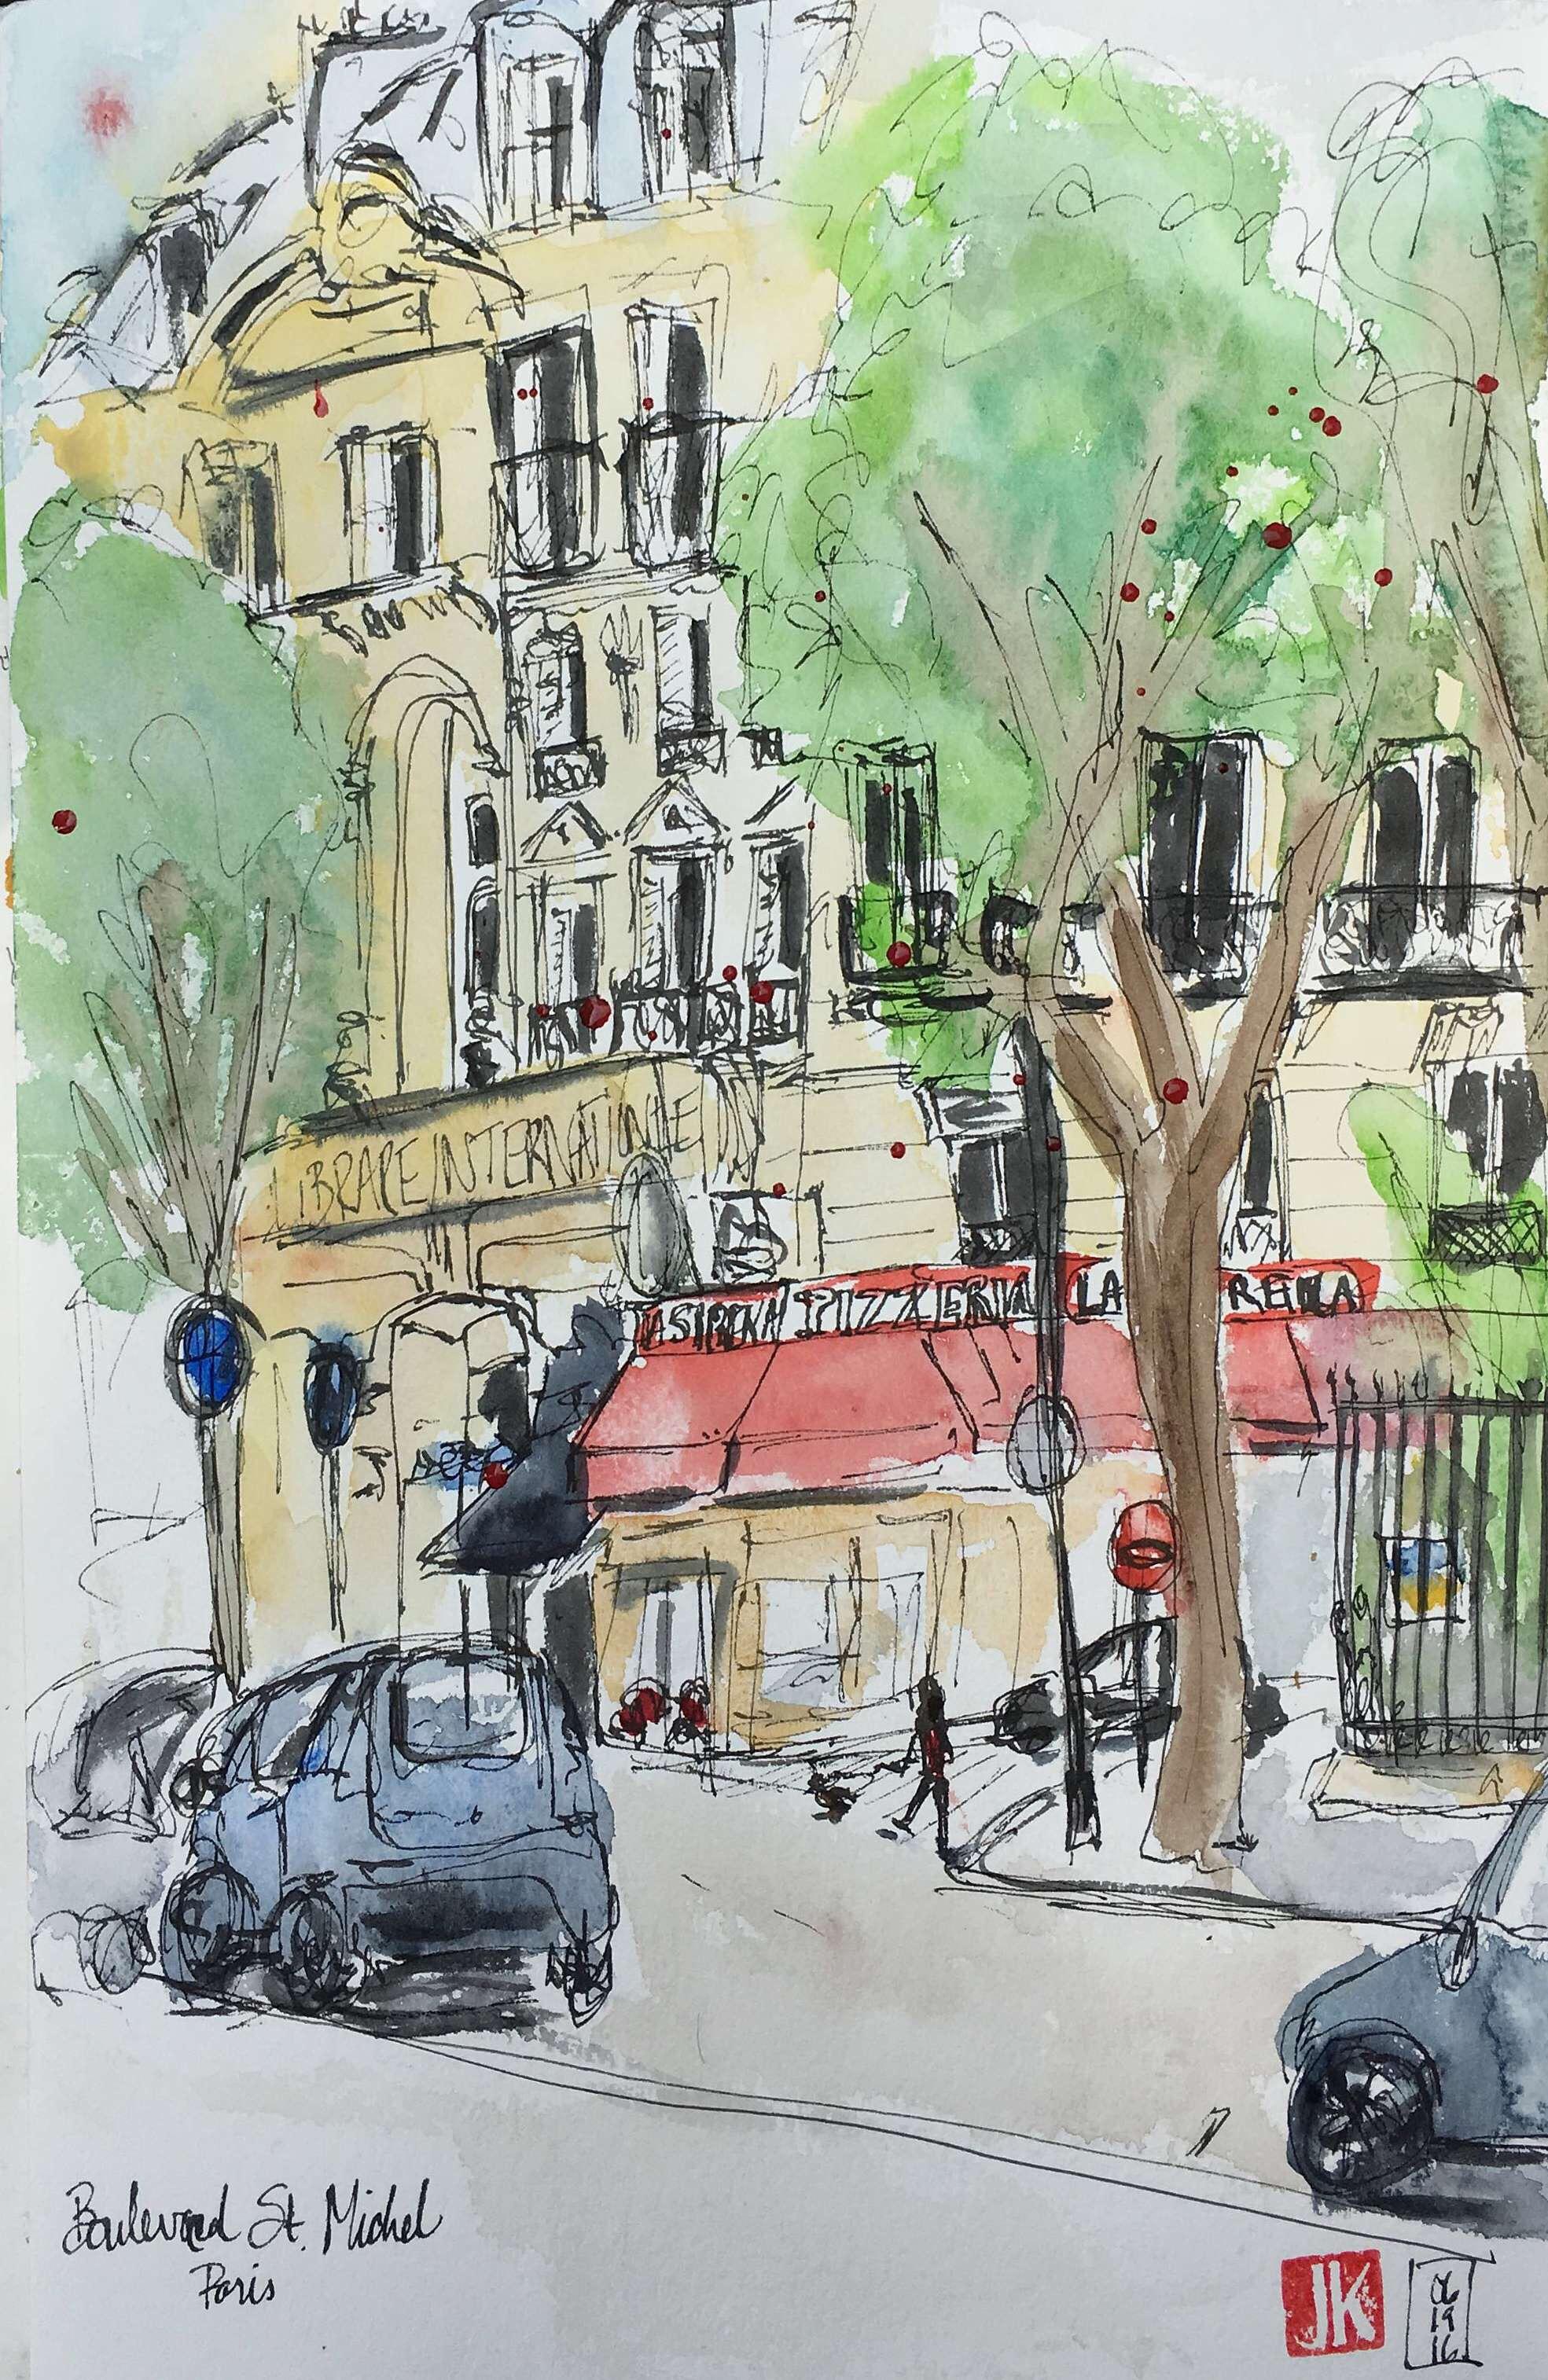 Our last breakfast in Paris on Boulevard Saint Michel